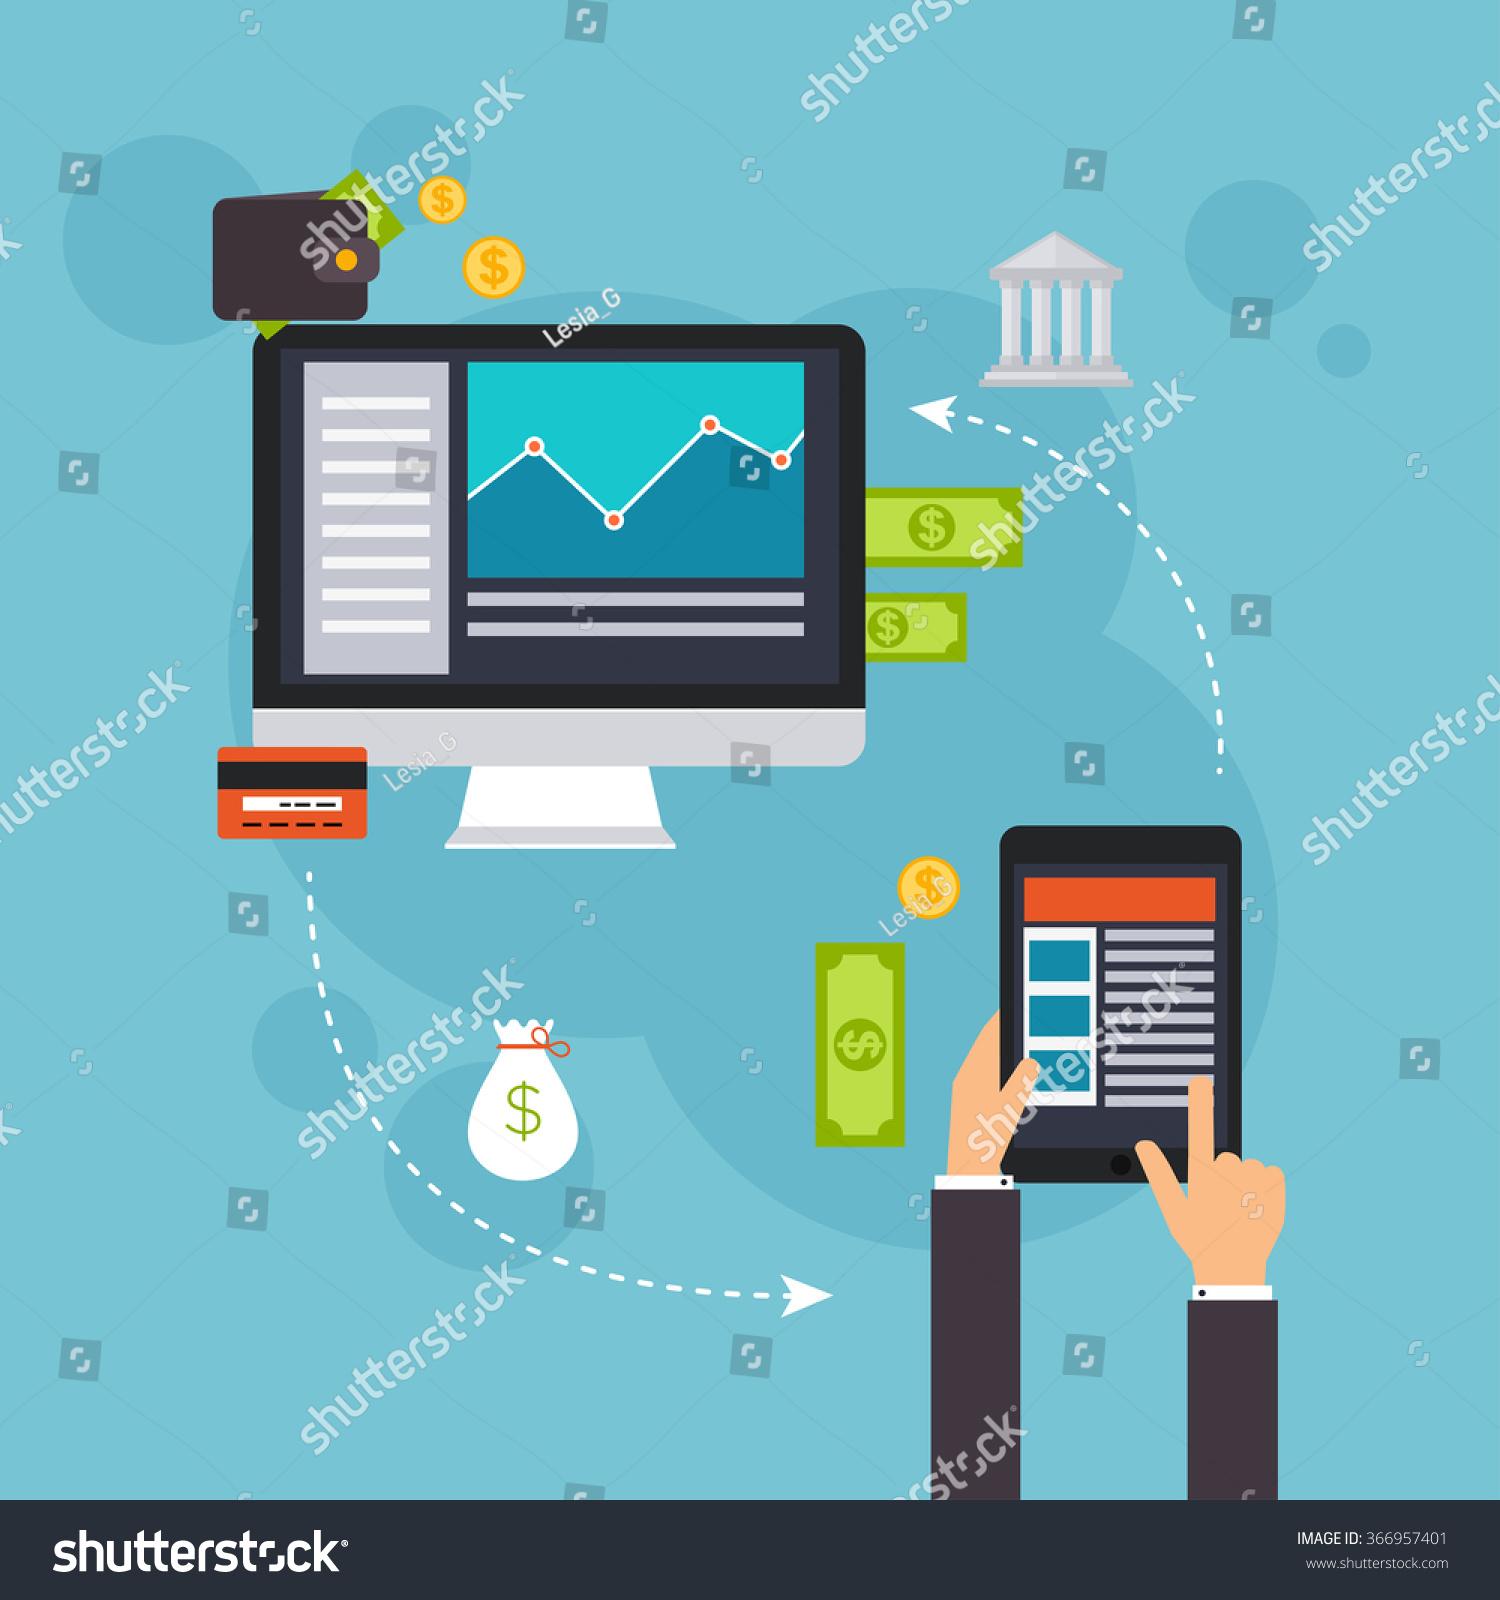 Flat Design Vector Illustration Concepts Online Stock Vector ...